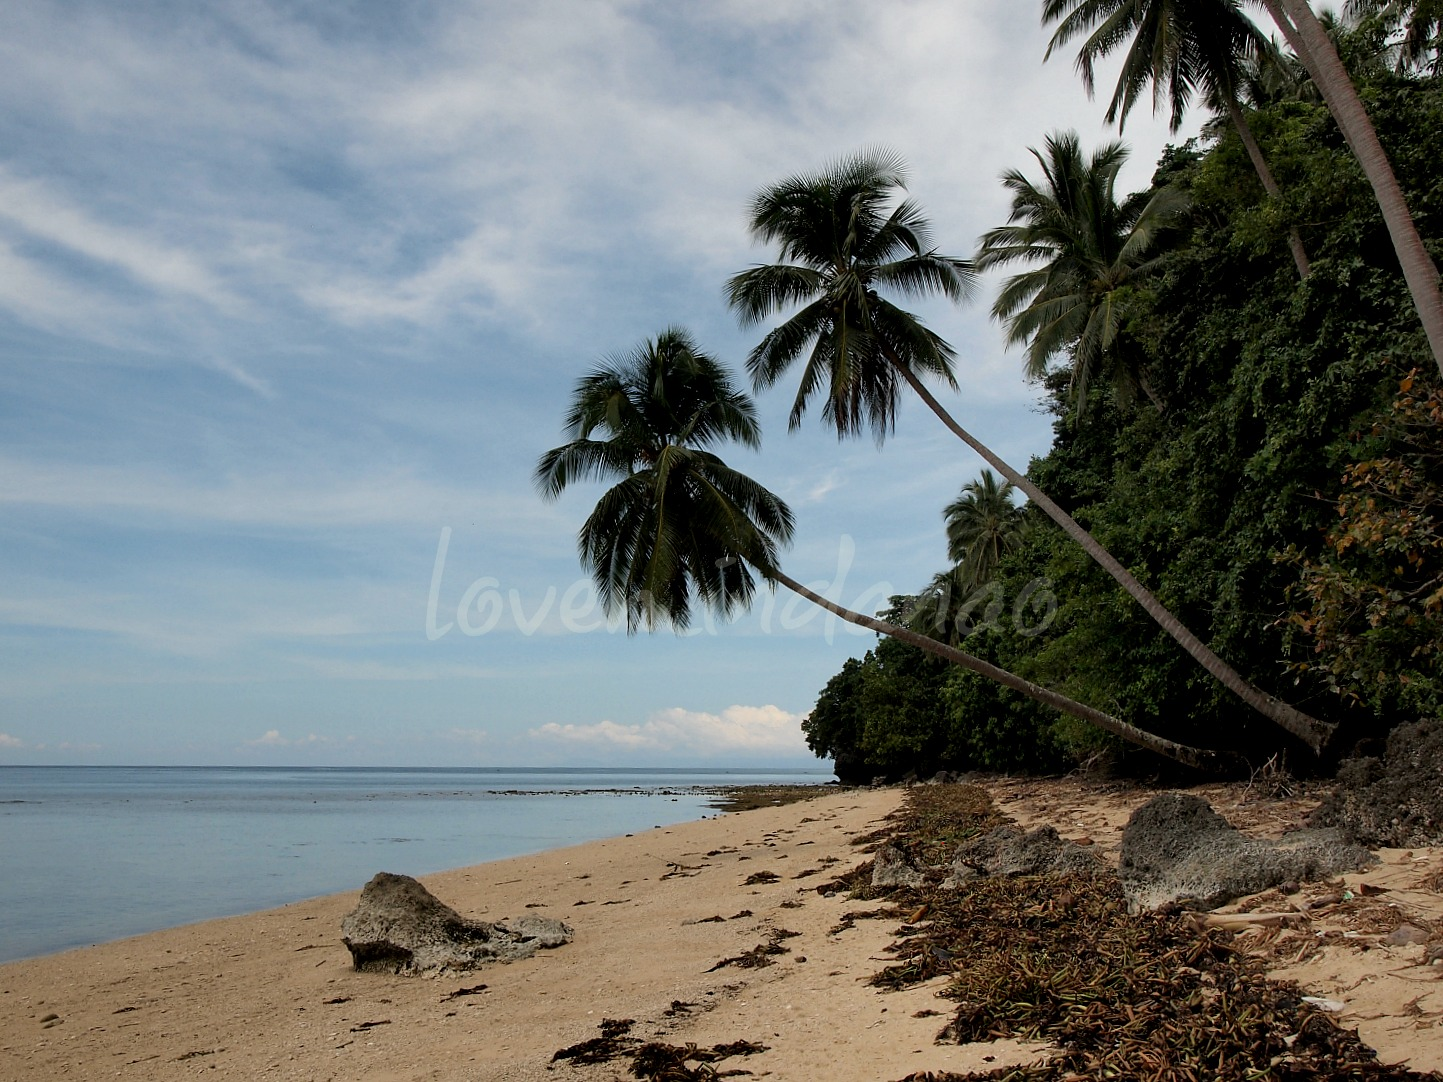 Love Mindanao: Bongo Island-Limbayan, Manguindanao | The Off